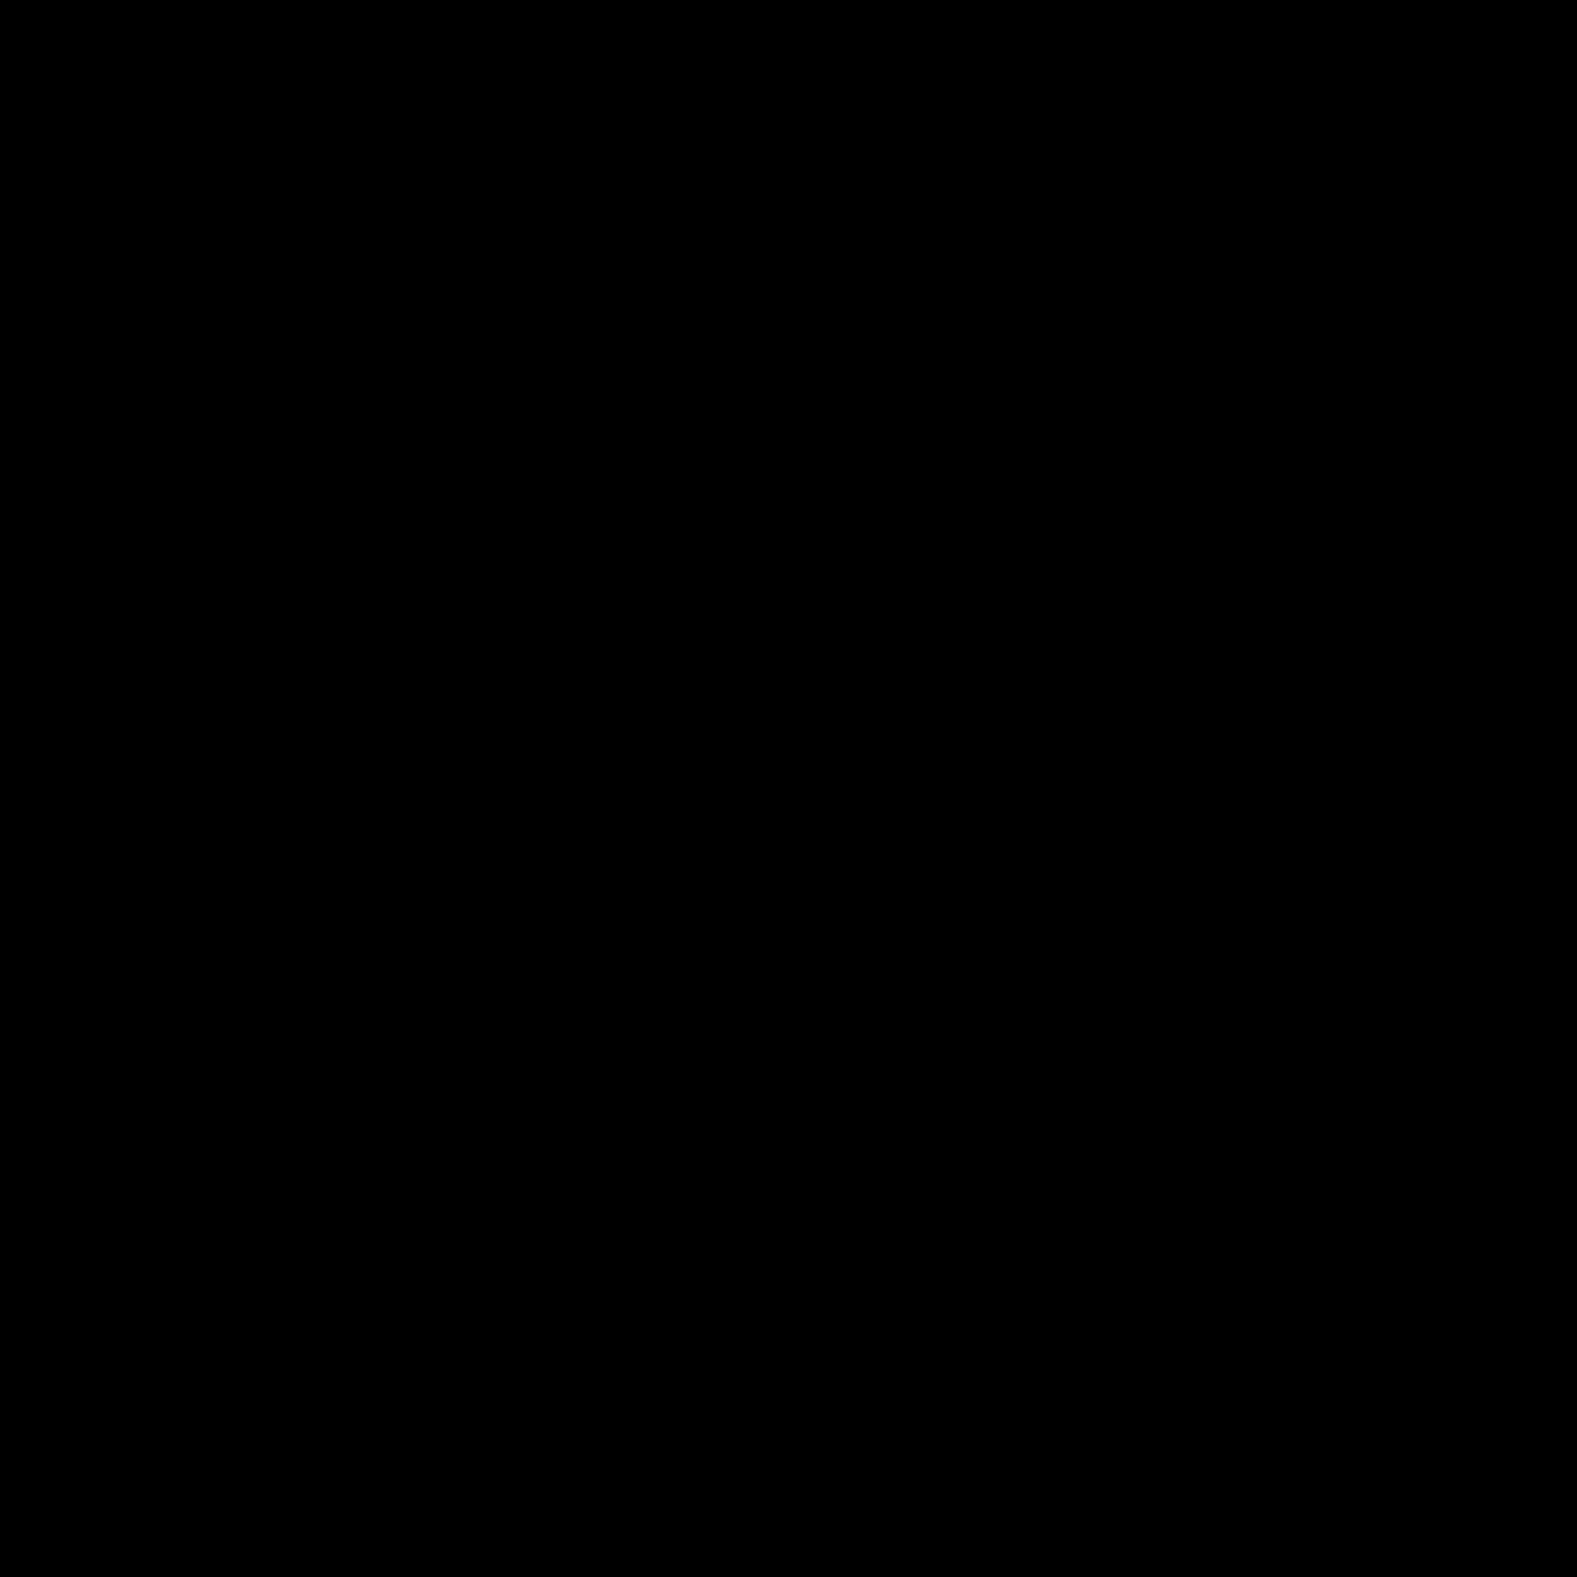 Christmas Candy Icon - Dulce Icono (1600x1600)